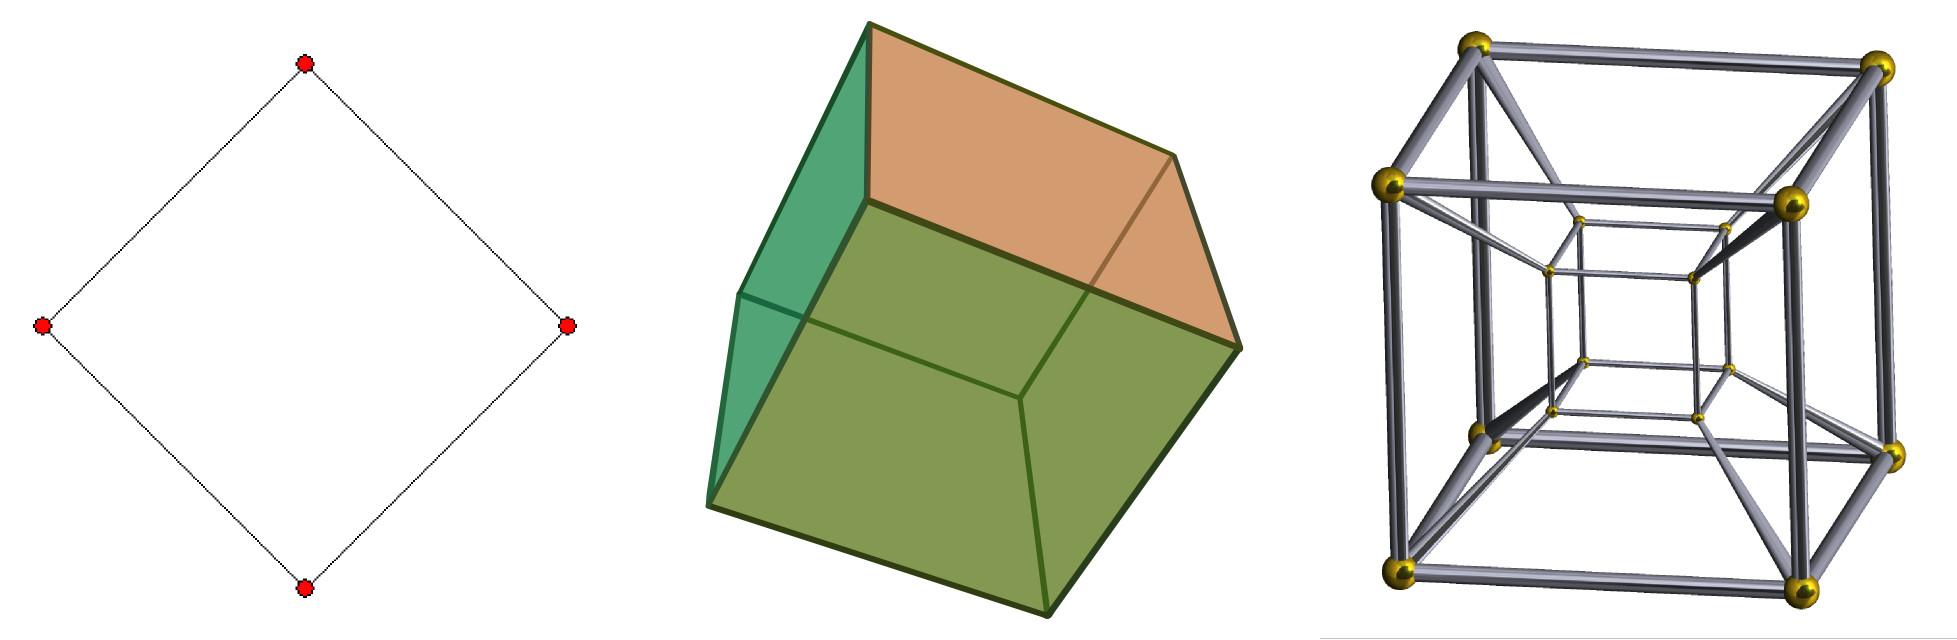 squarecubetesseract png